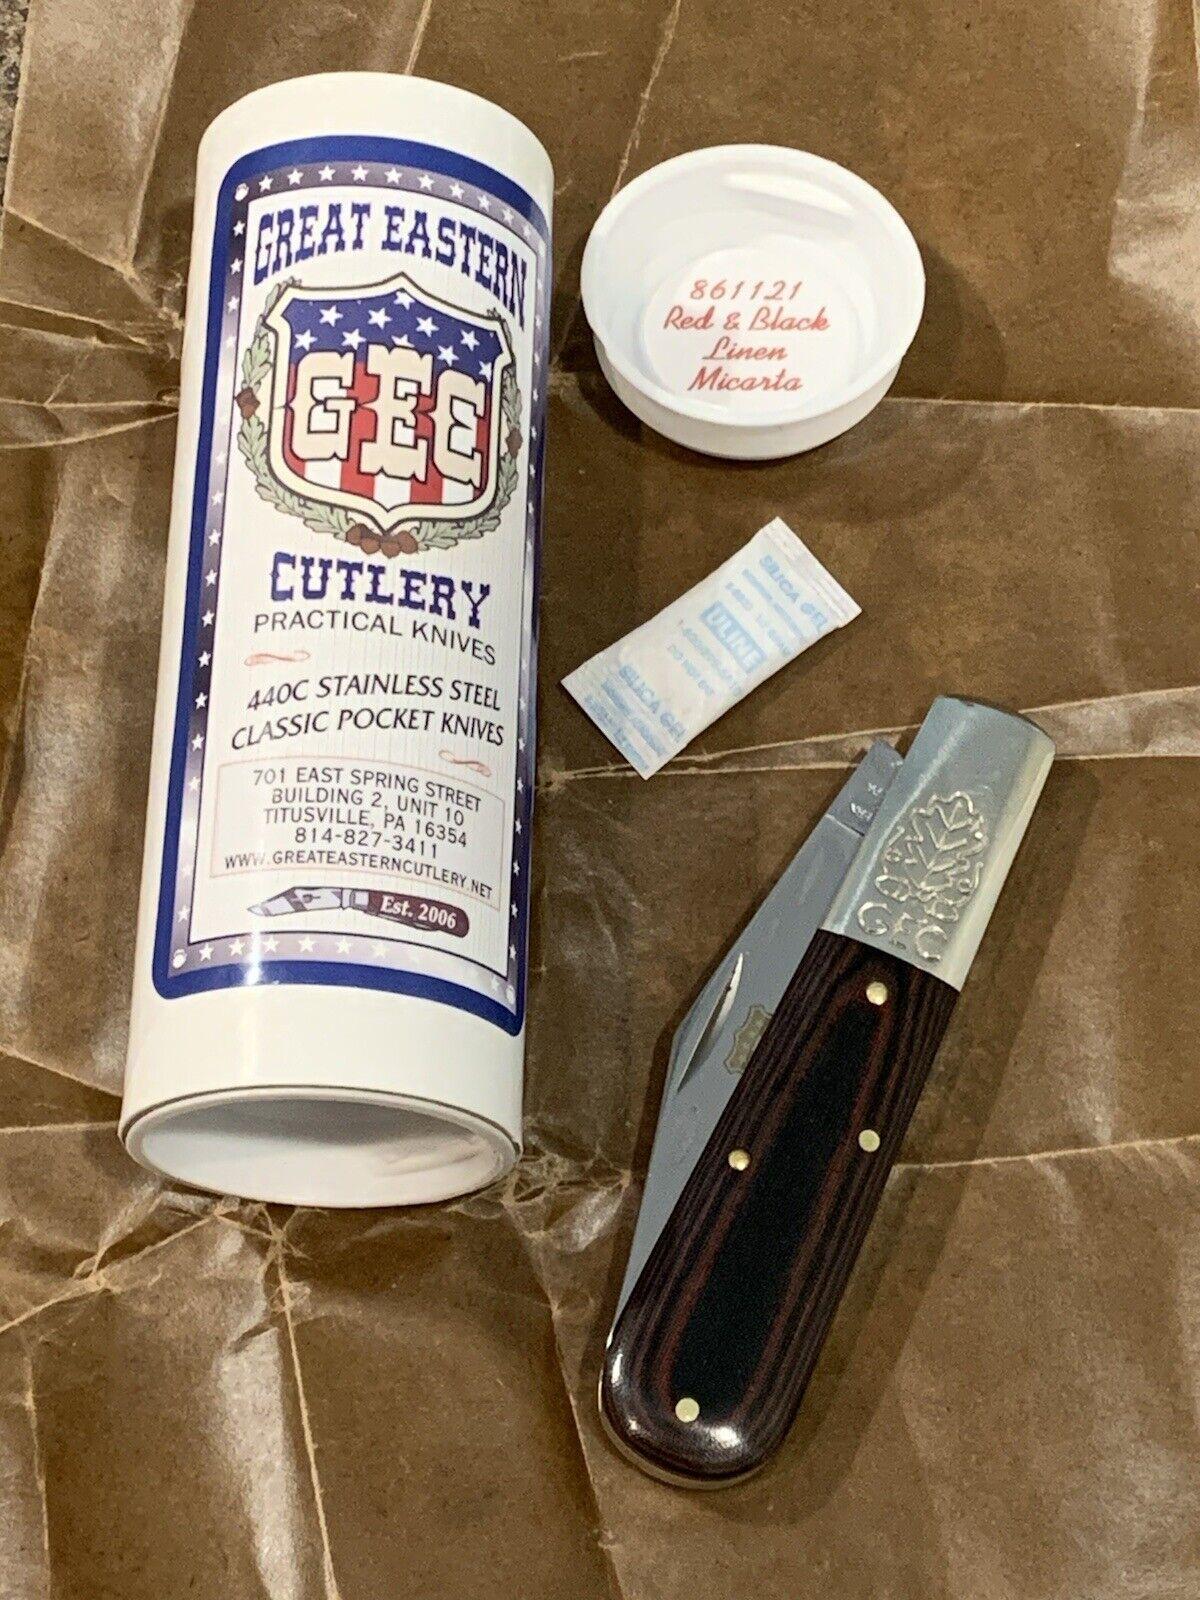 GEC / Great Eastern Cutlery #86 / Two Acorn Barlow 861221 - Red & Black Micarta